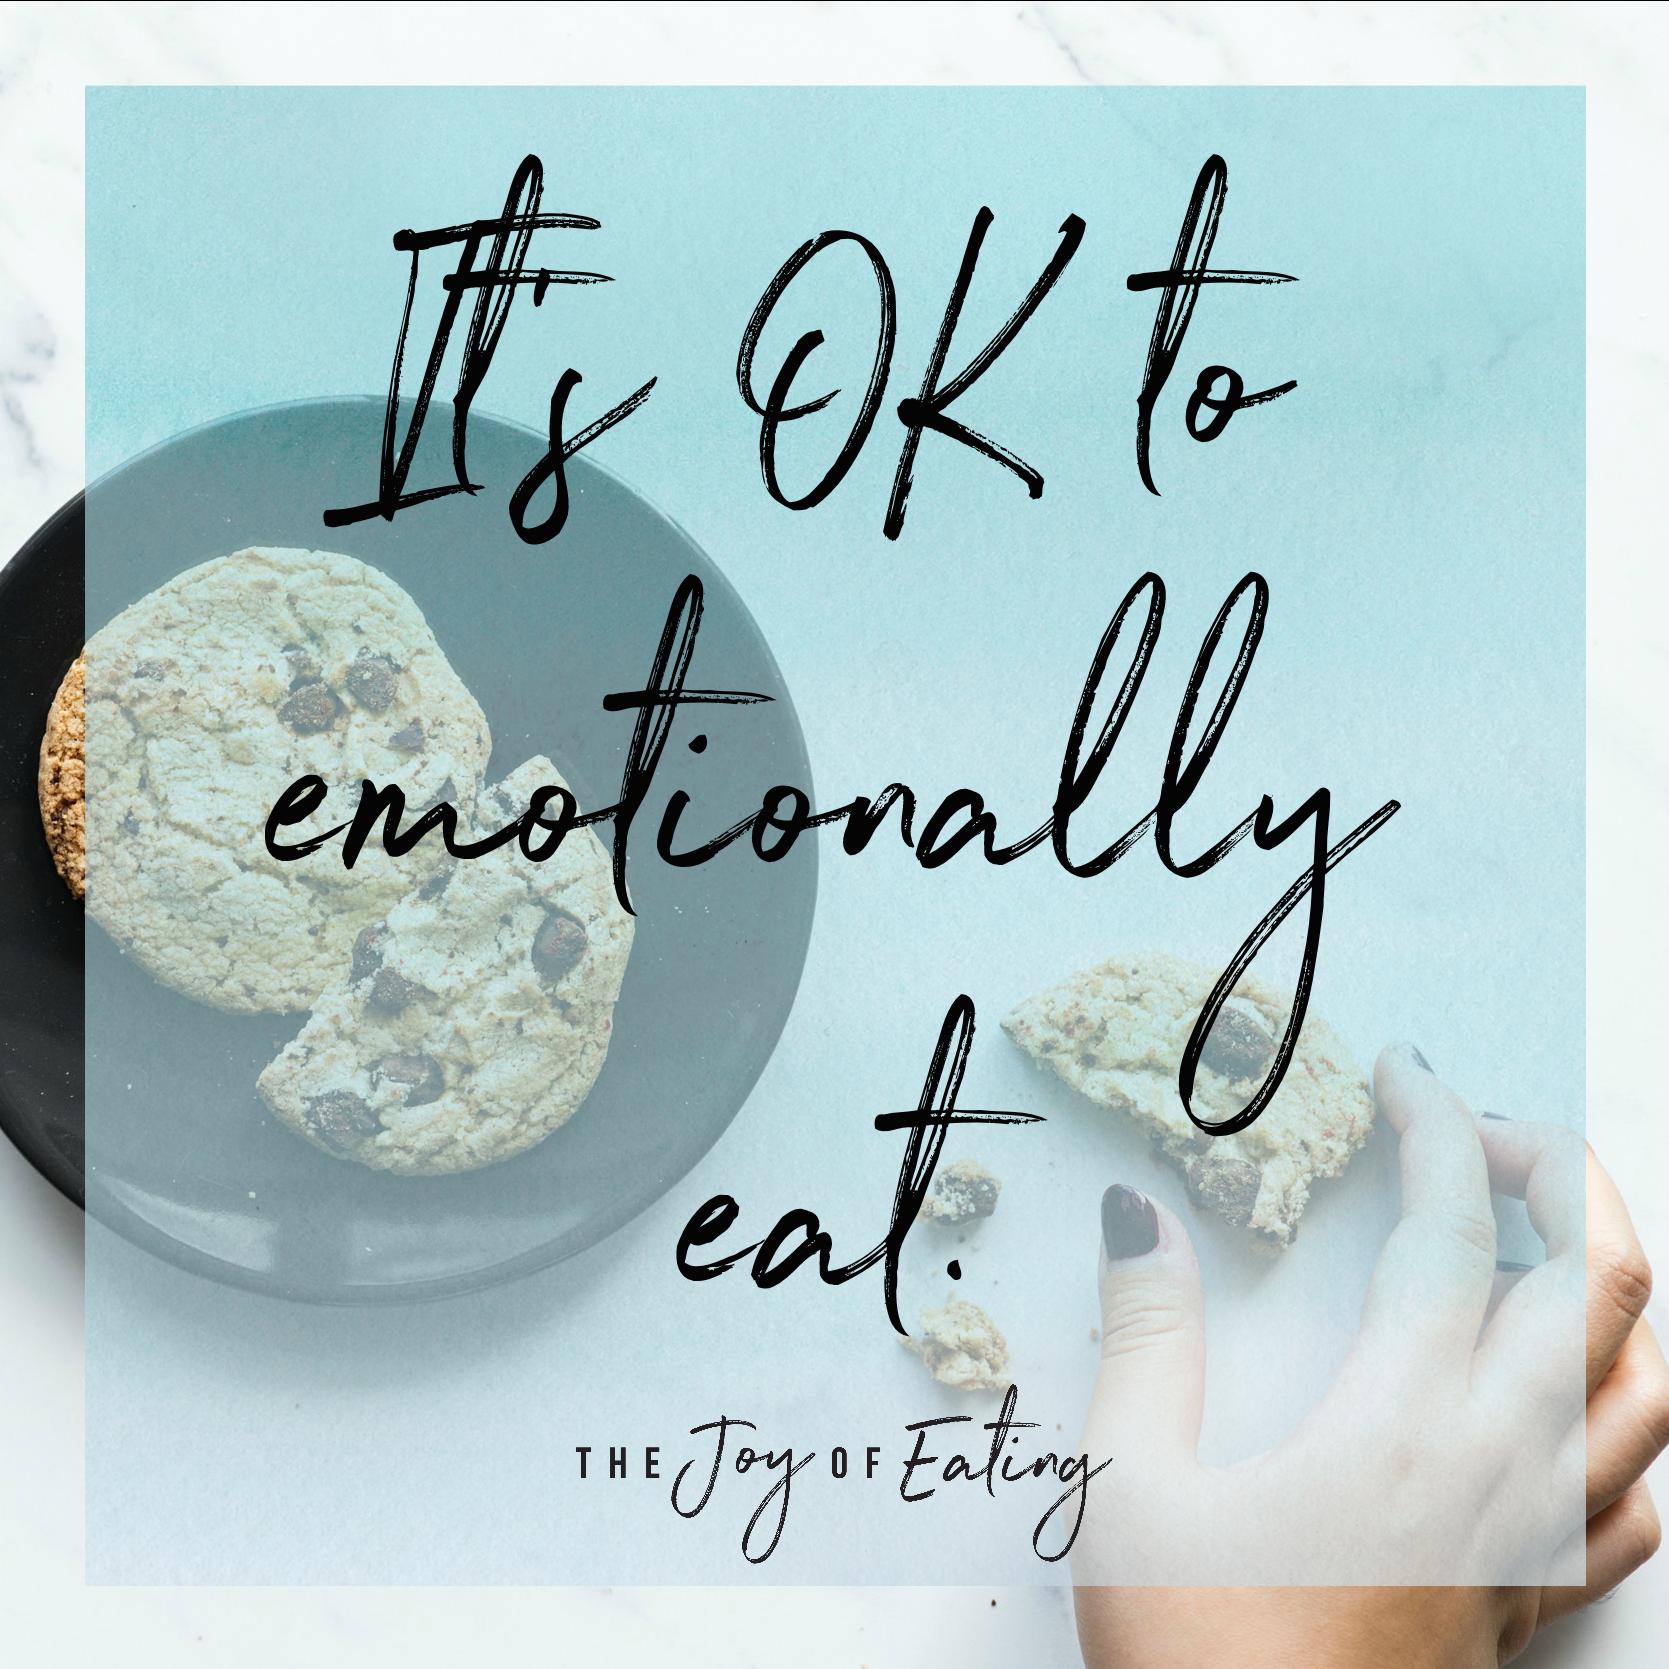 It's ok to emotionally eat.